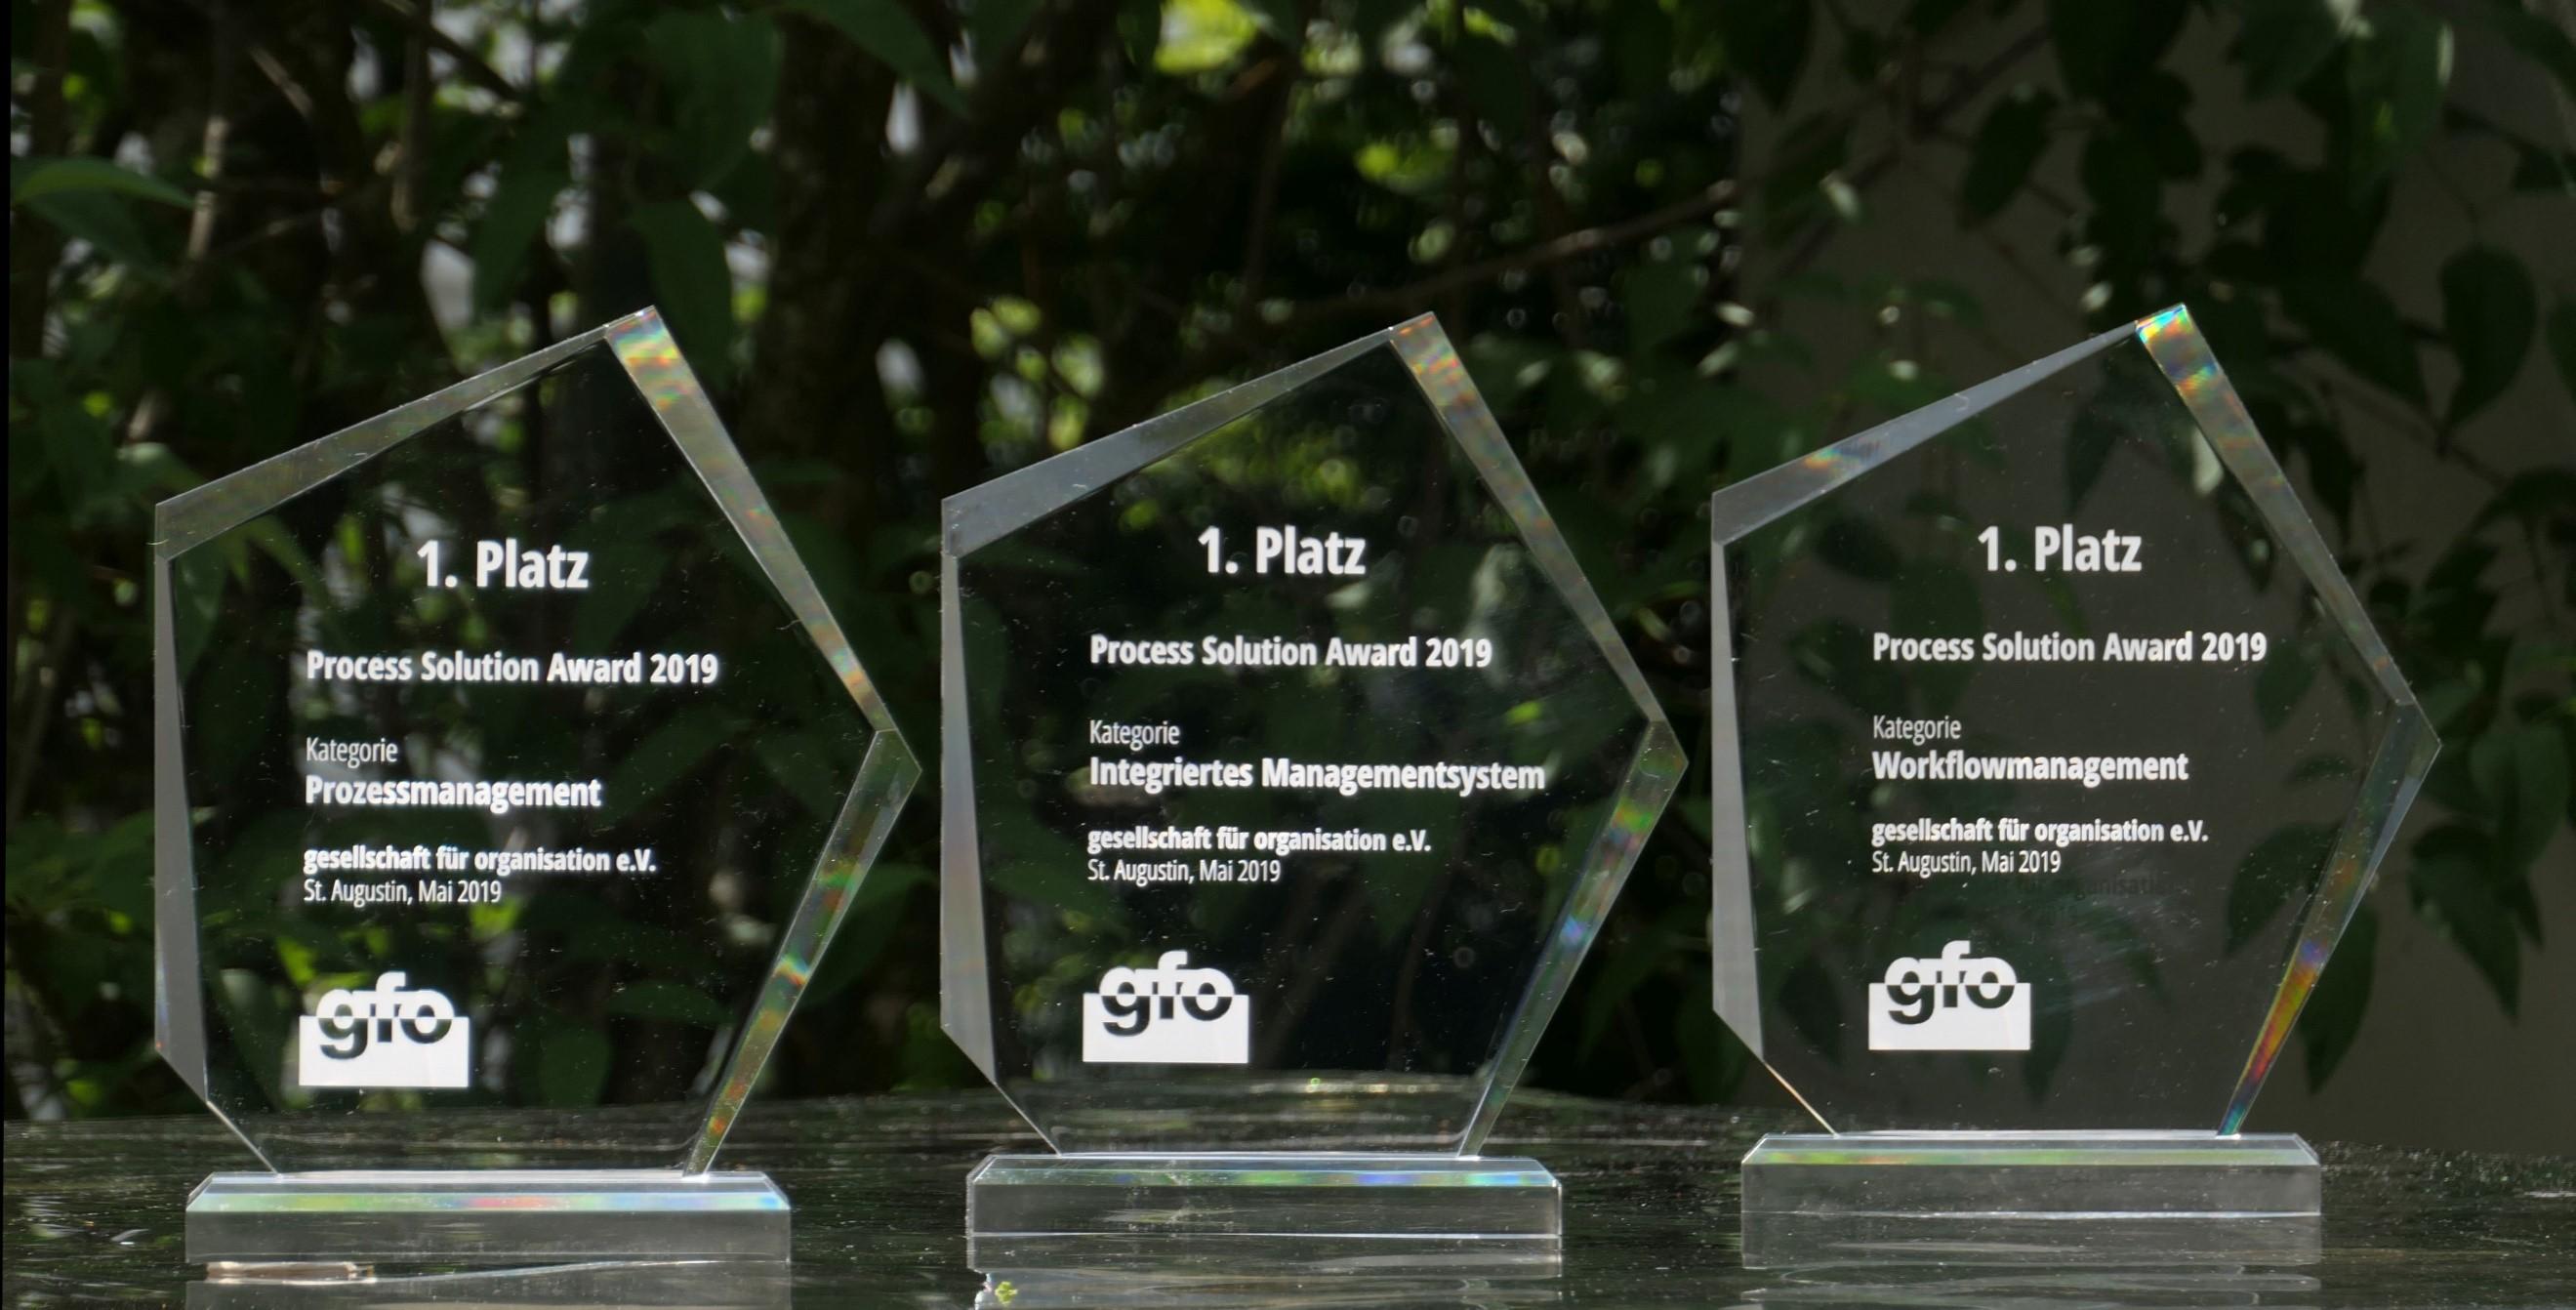 process solution award